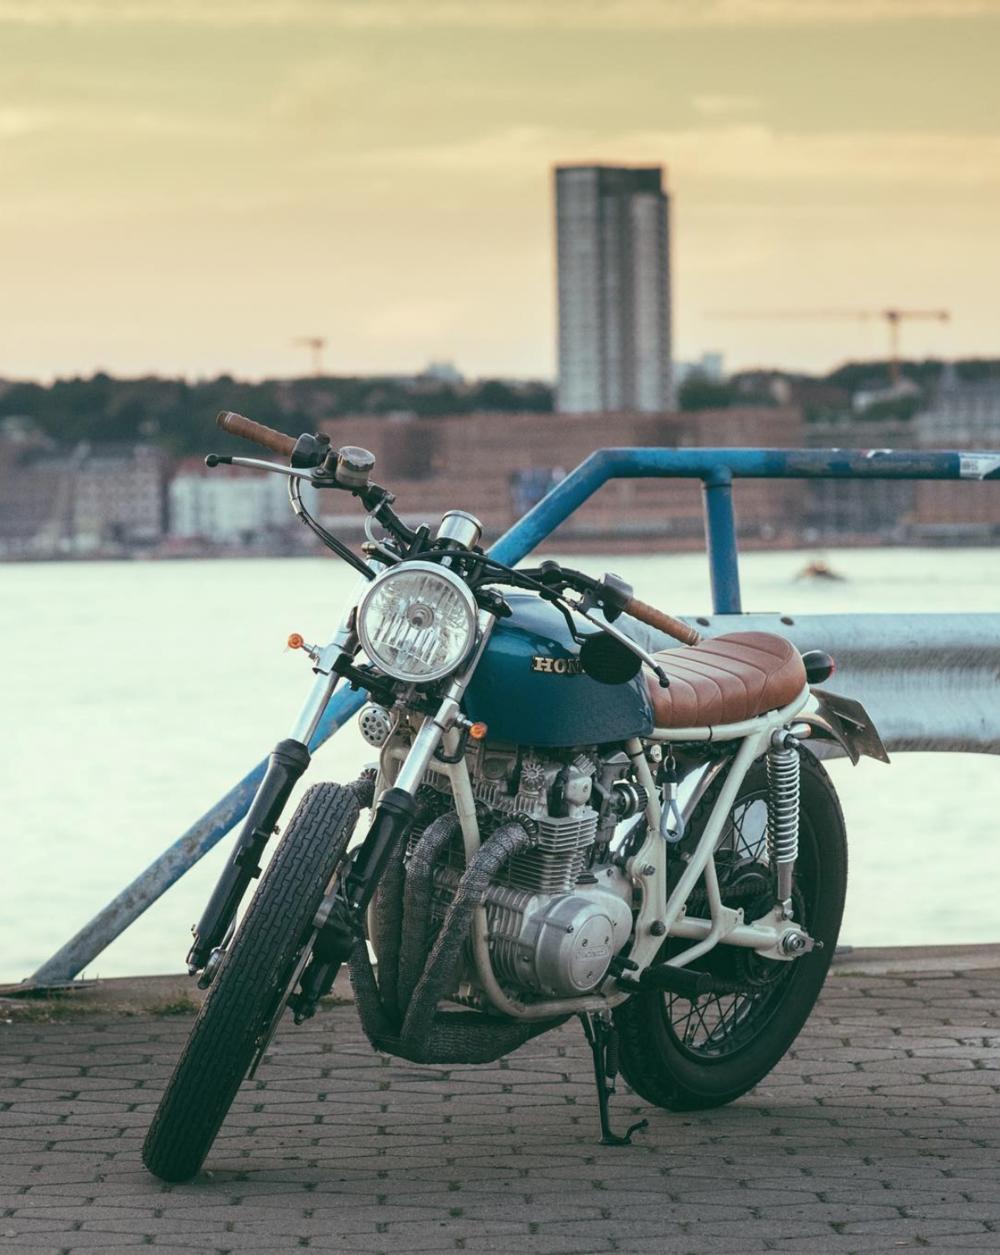 Jörg's Ride | TheMotoSocialHAMBURG